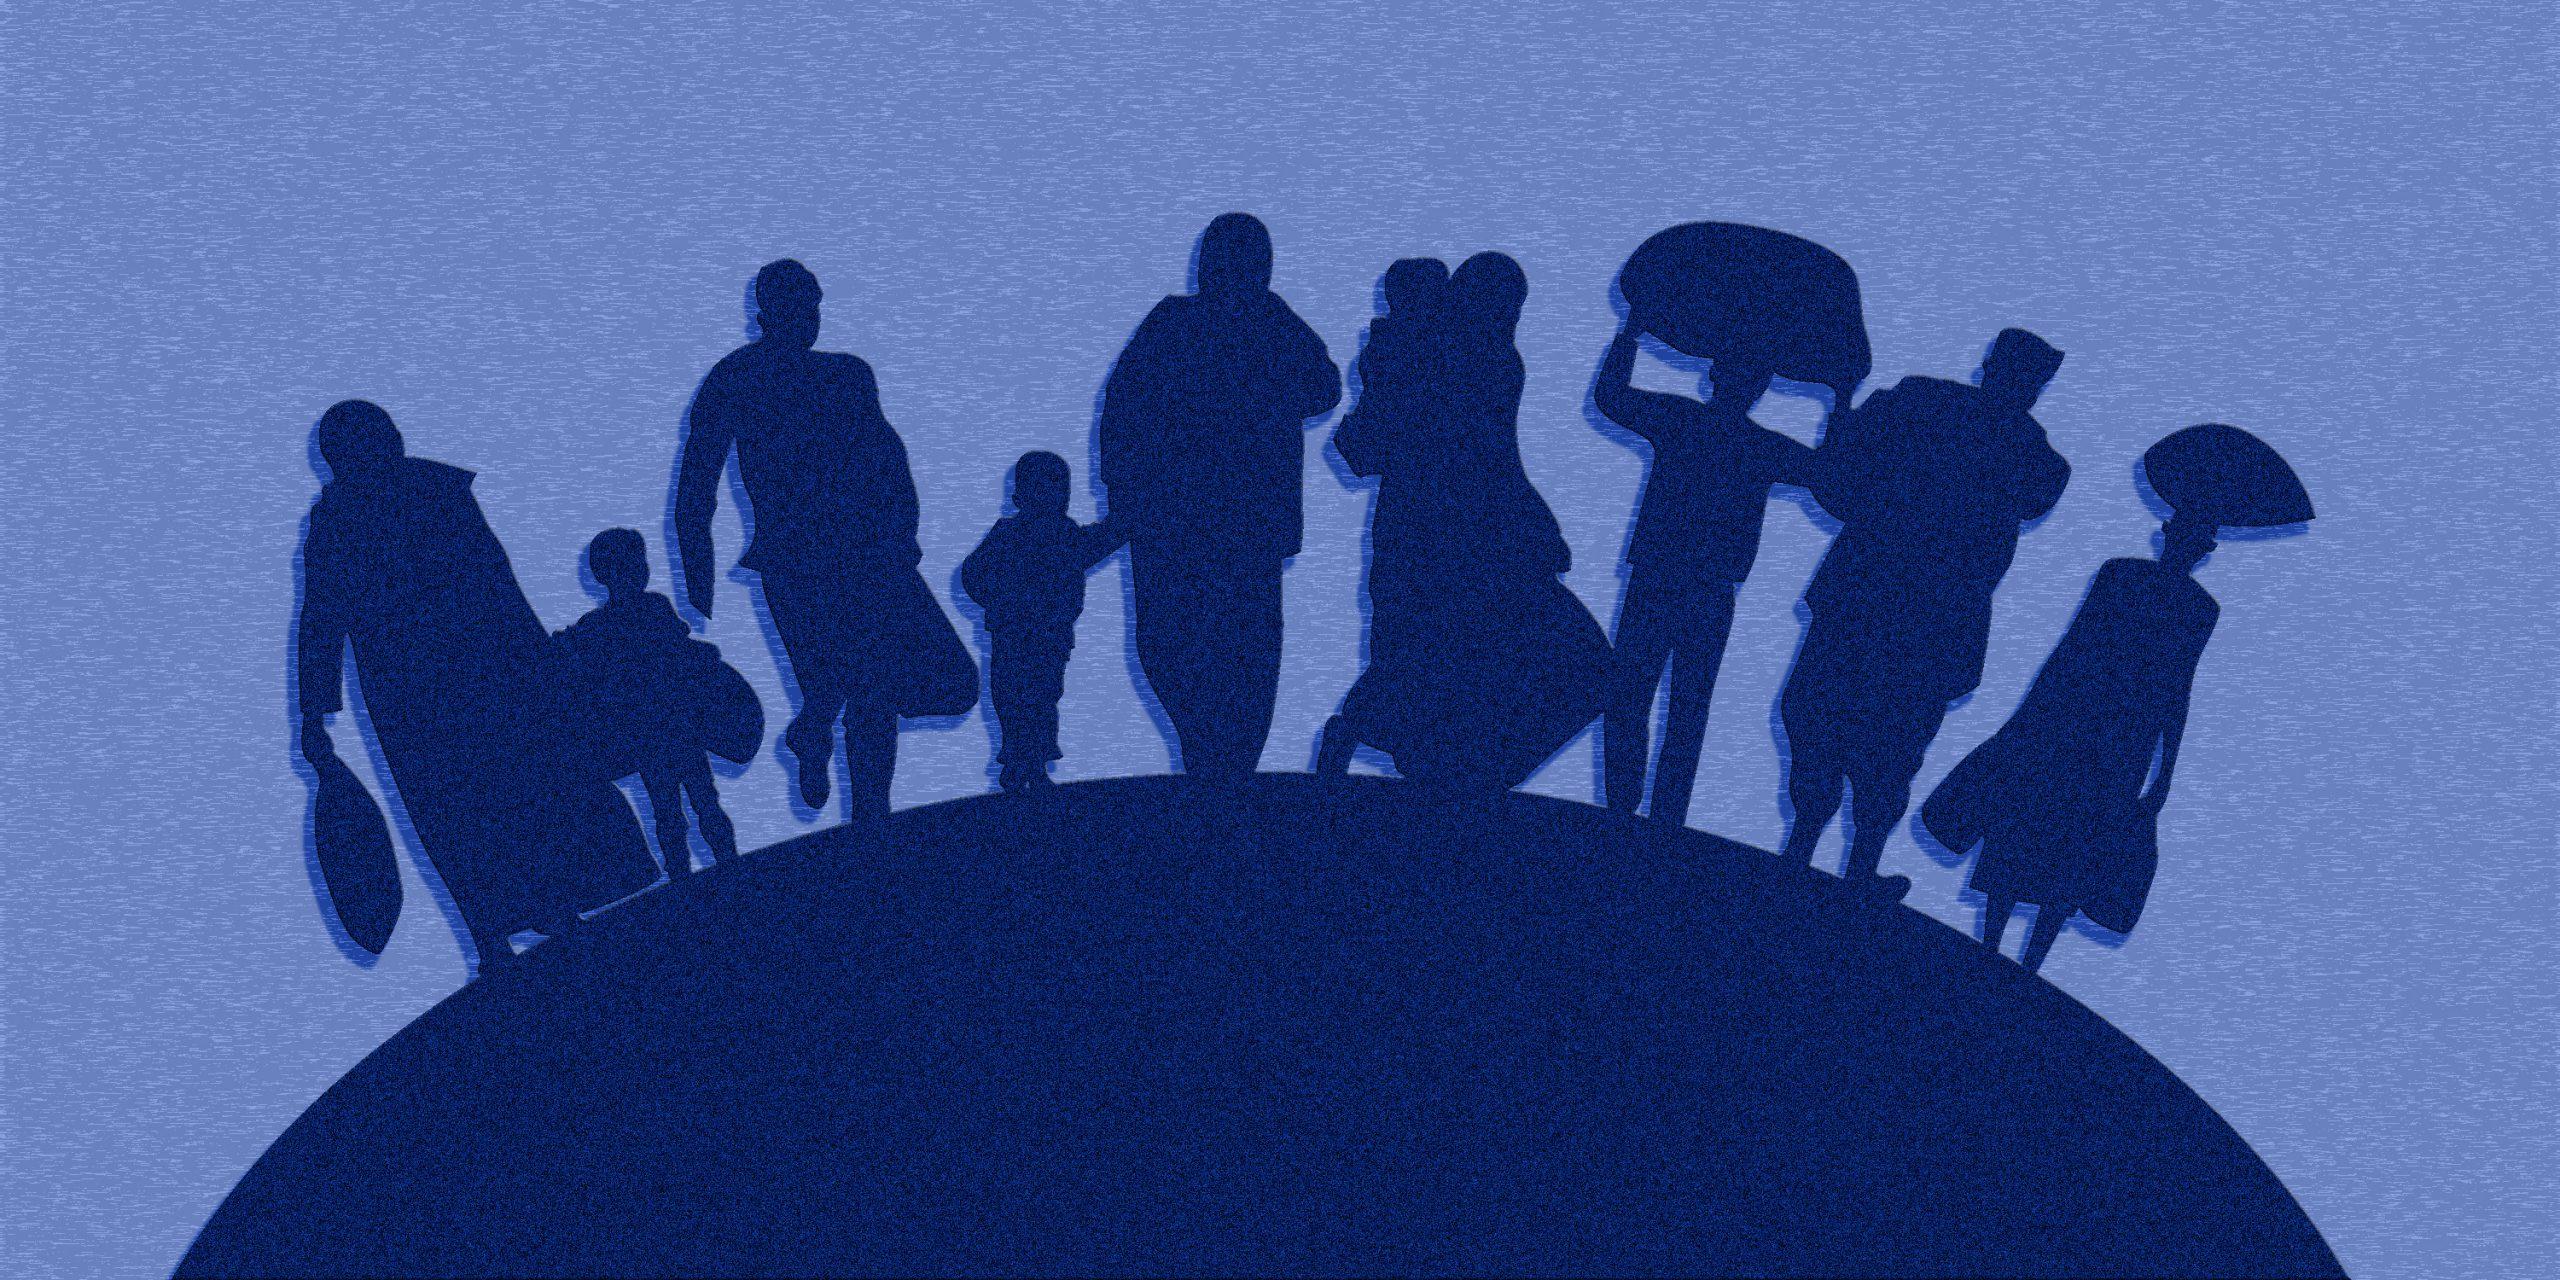 political refugees